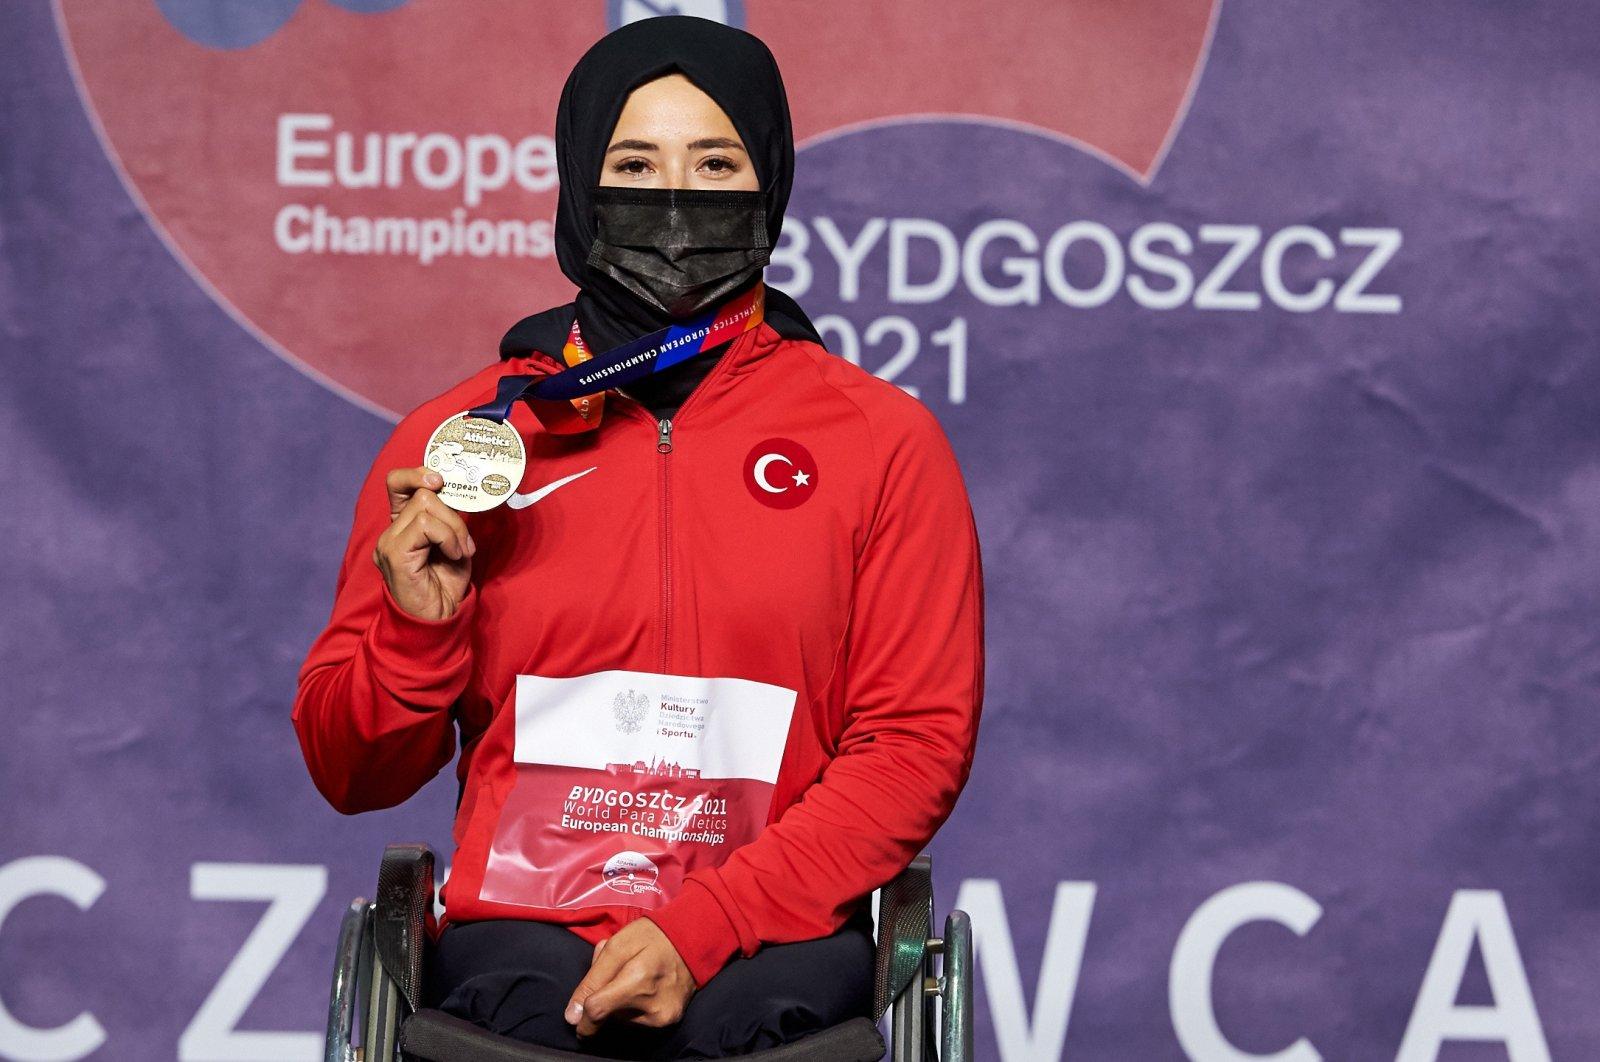 Turkish para-athlete Zübeyde Süpürgeci after winning gold at the Para Athletics European Championship, Bydgoszcz, Poland, June 1, 2021.